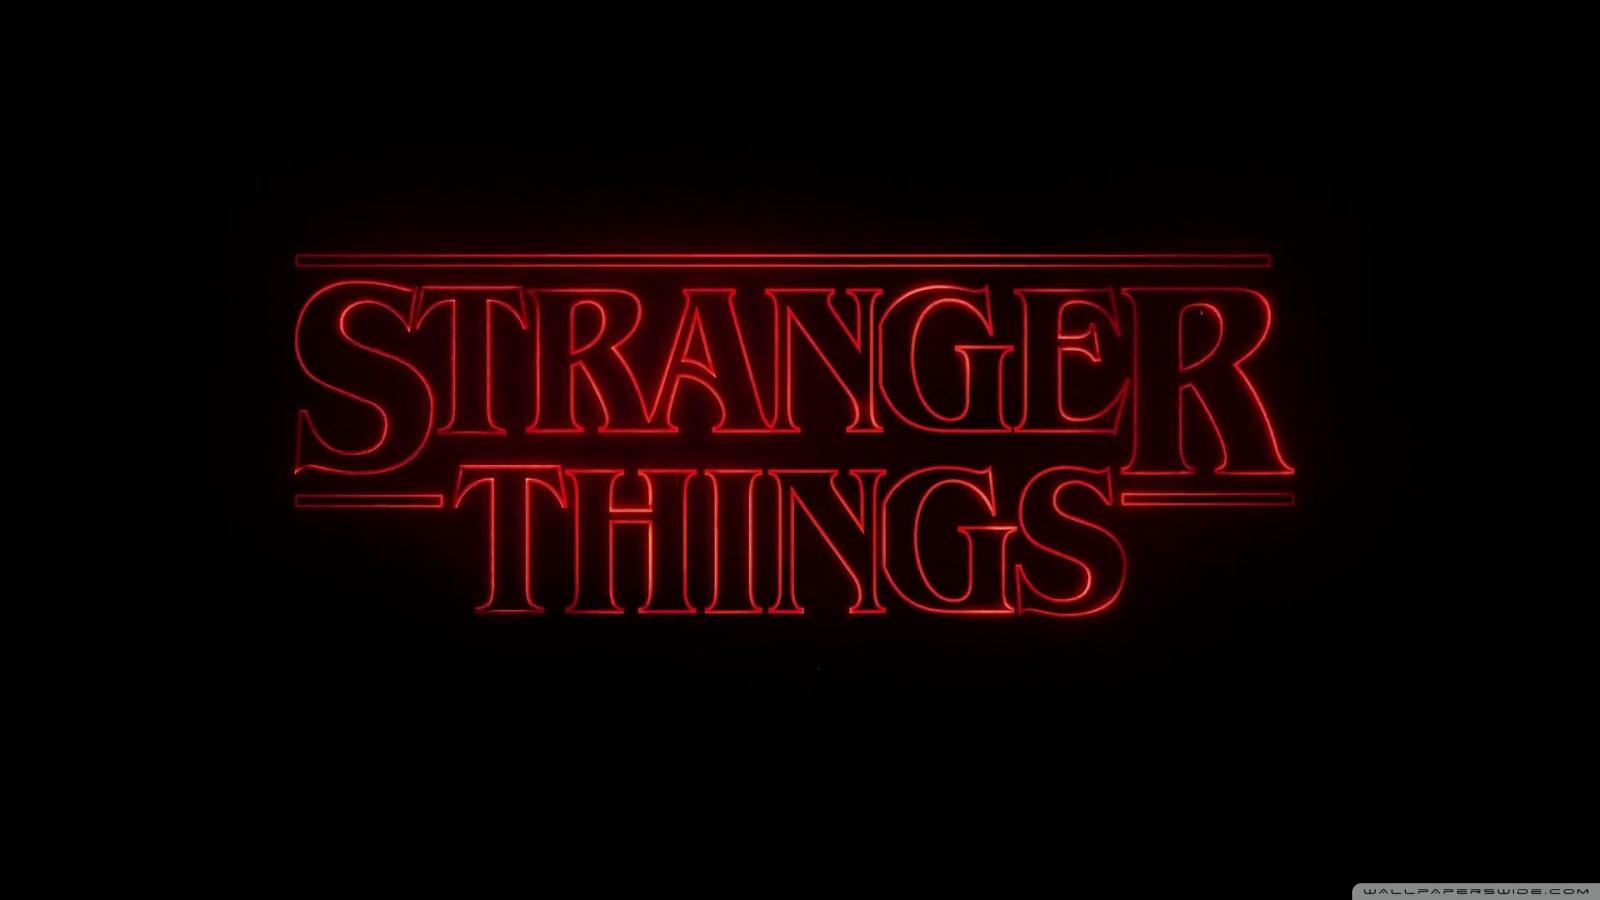 Ipad Stranger Things Wallpaper 4k 1600x900